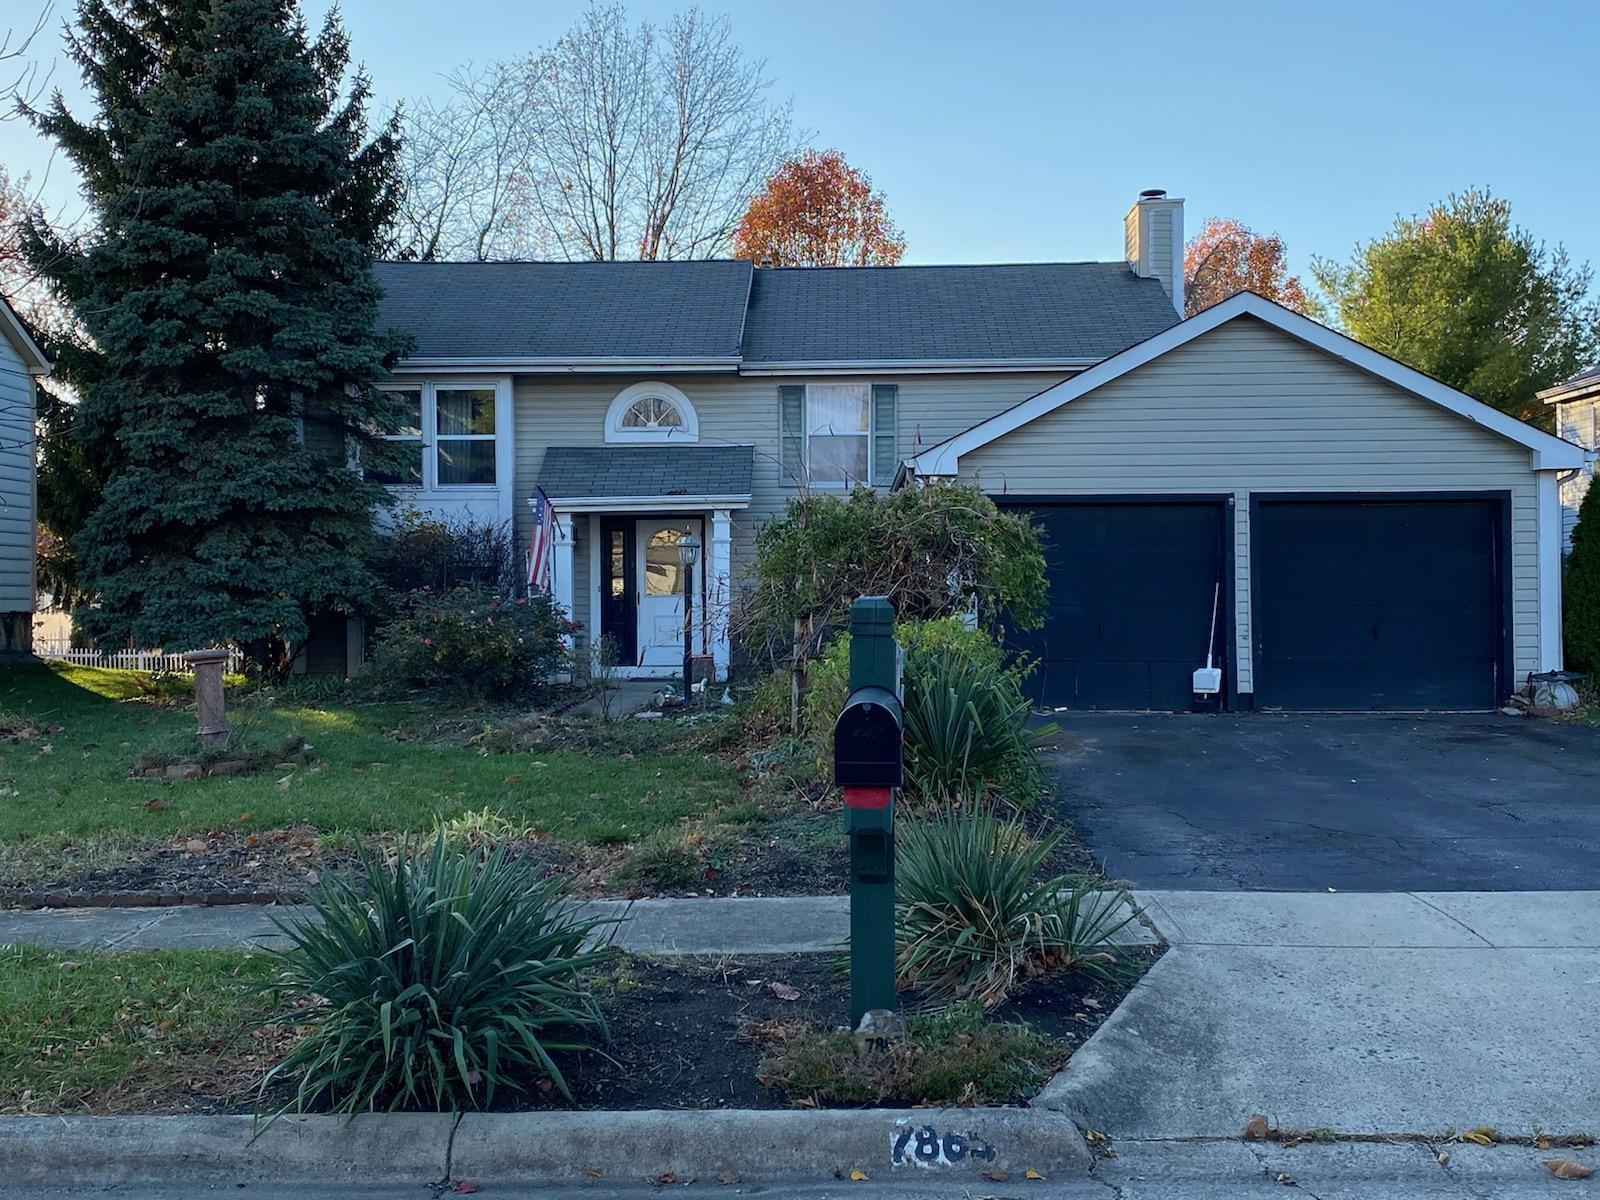 7865 Cobdon Avenue, Westerville, Ohio 43081, 5 Bedrooms Bedrooms, ,3 BathroomsBathrooms,Residential,For Sale,Cobdon,220040240